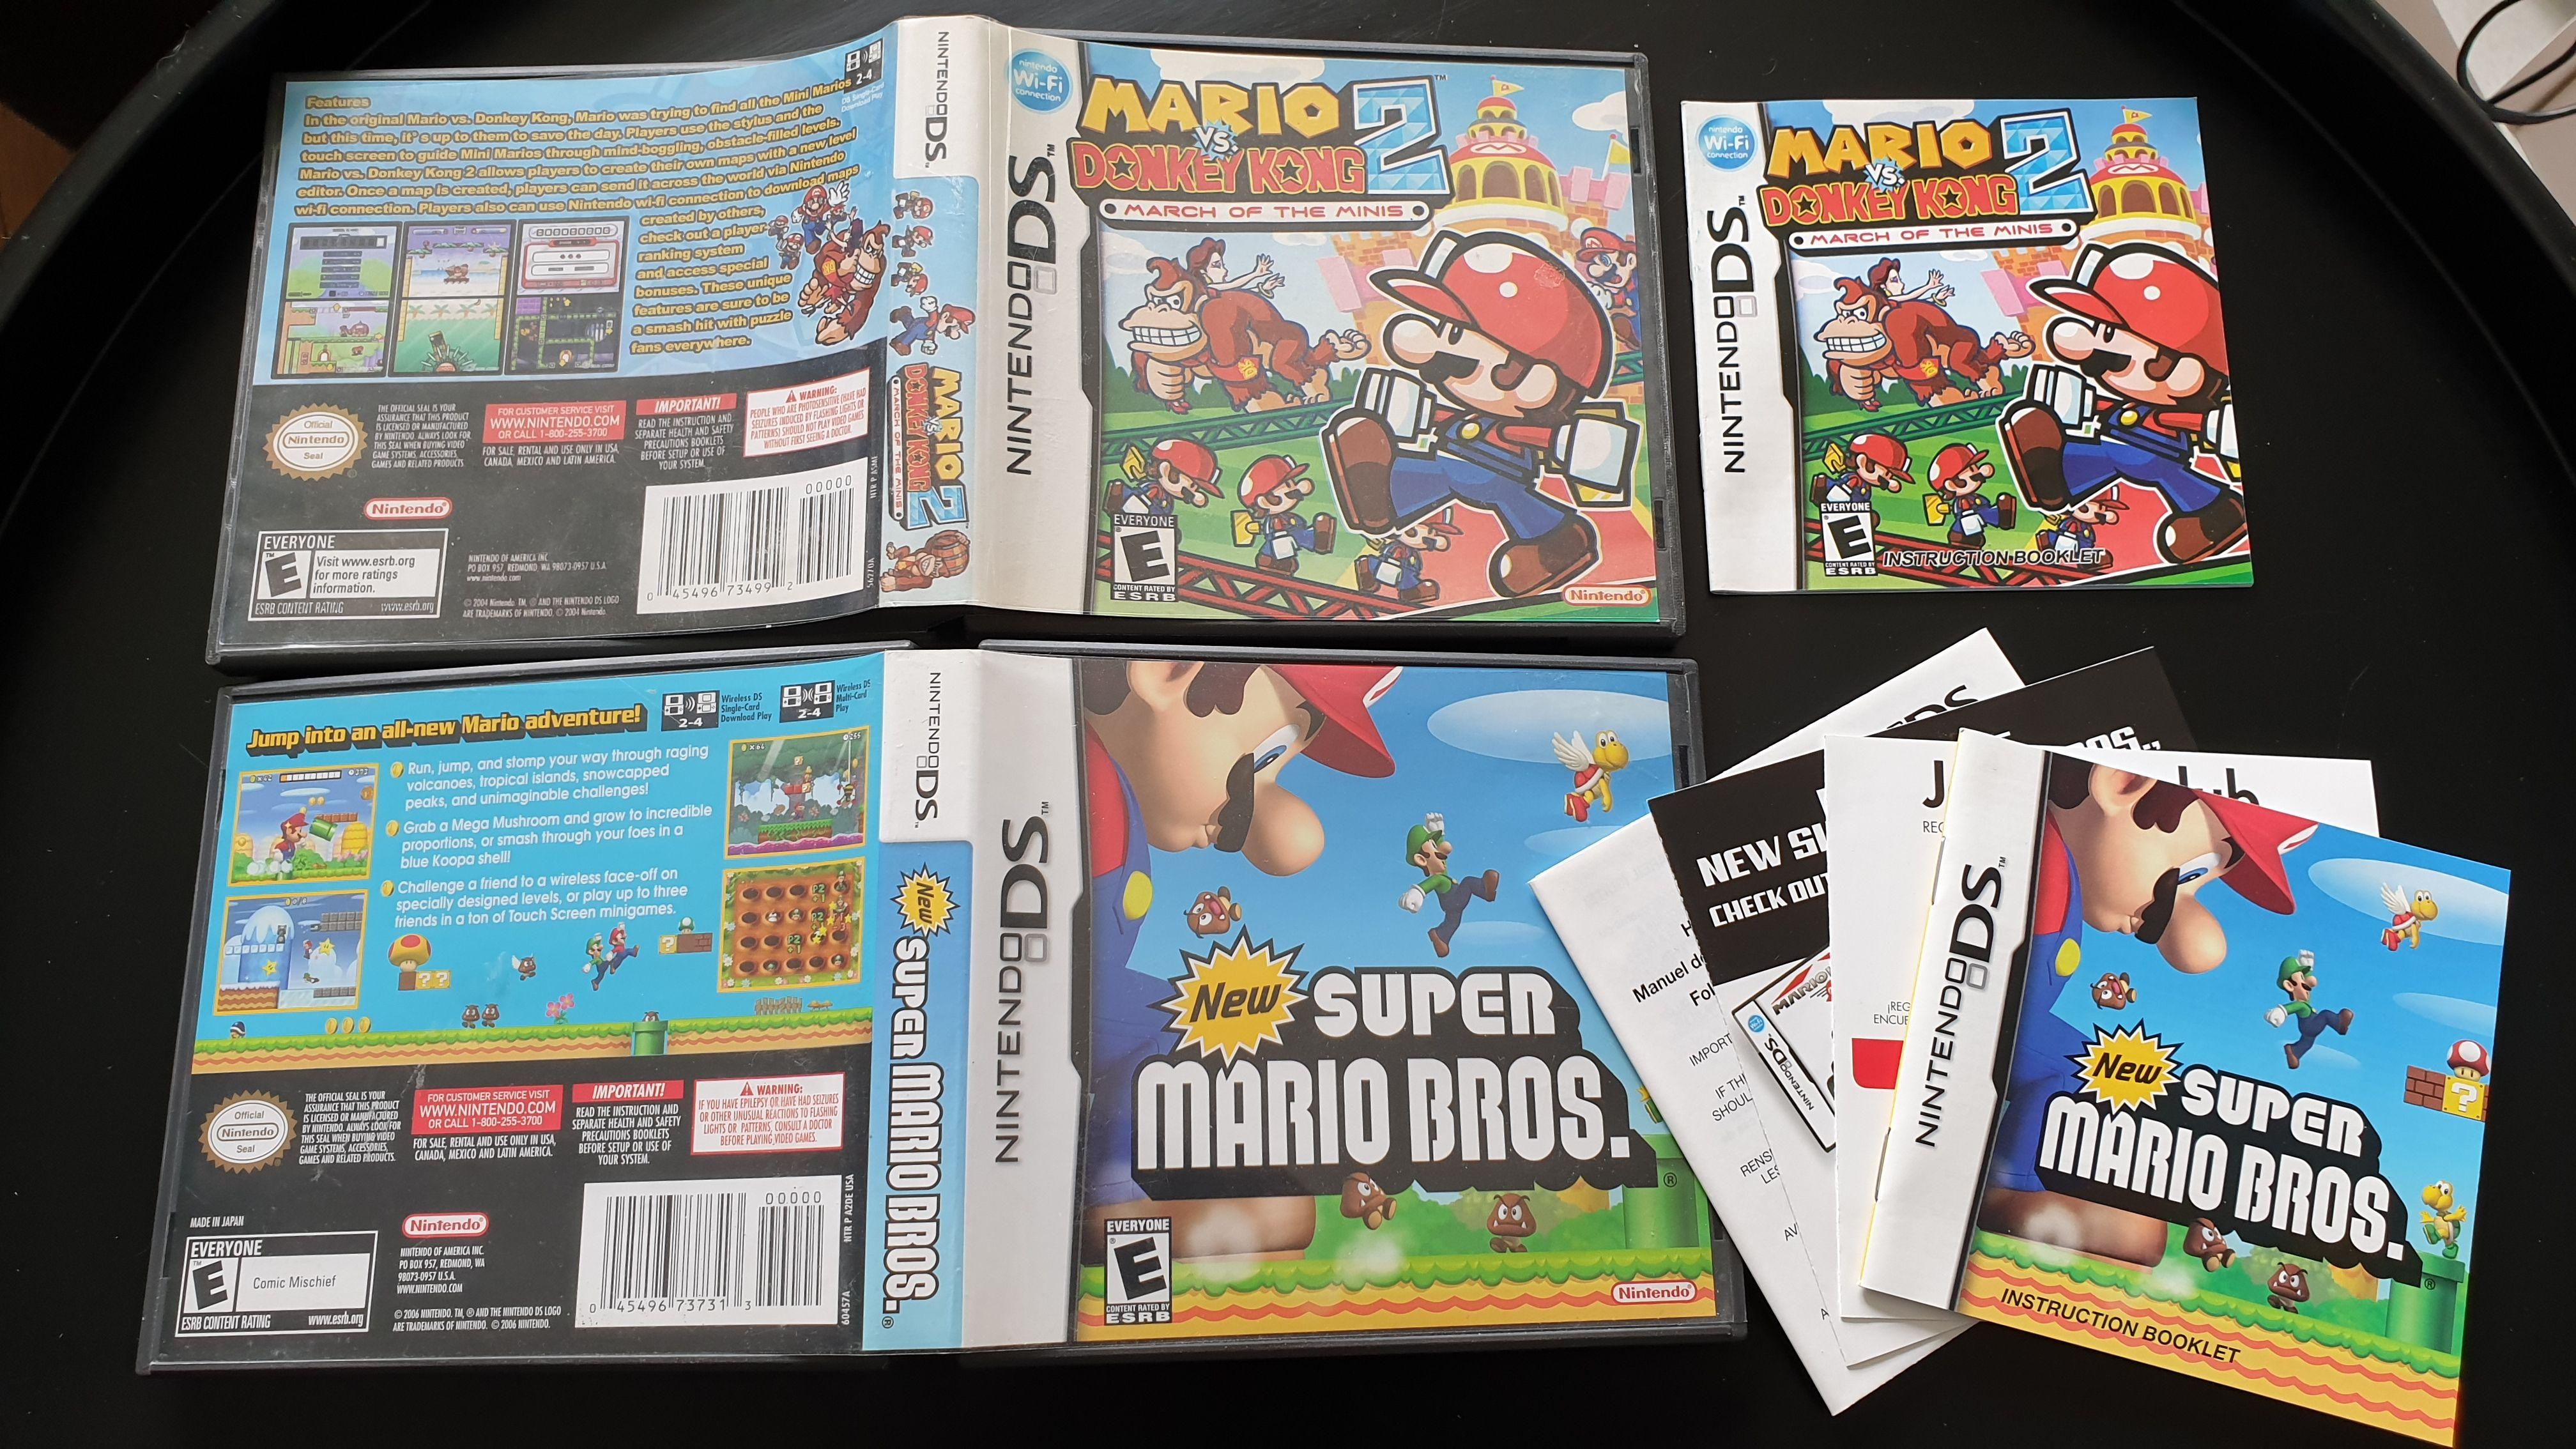 [ECH/RECH] Orphelins Sega / Sony / Nintendo et autre (photos) 1t5Fkc